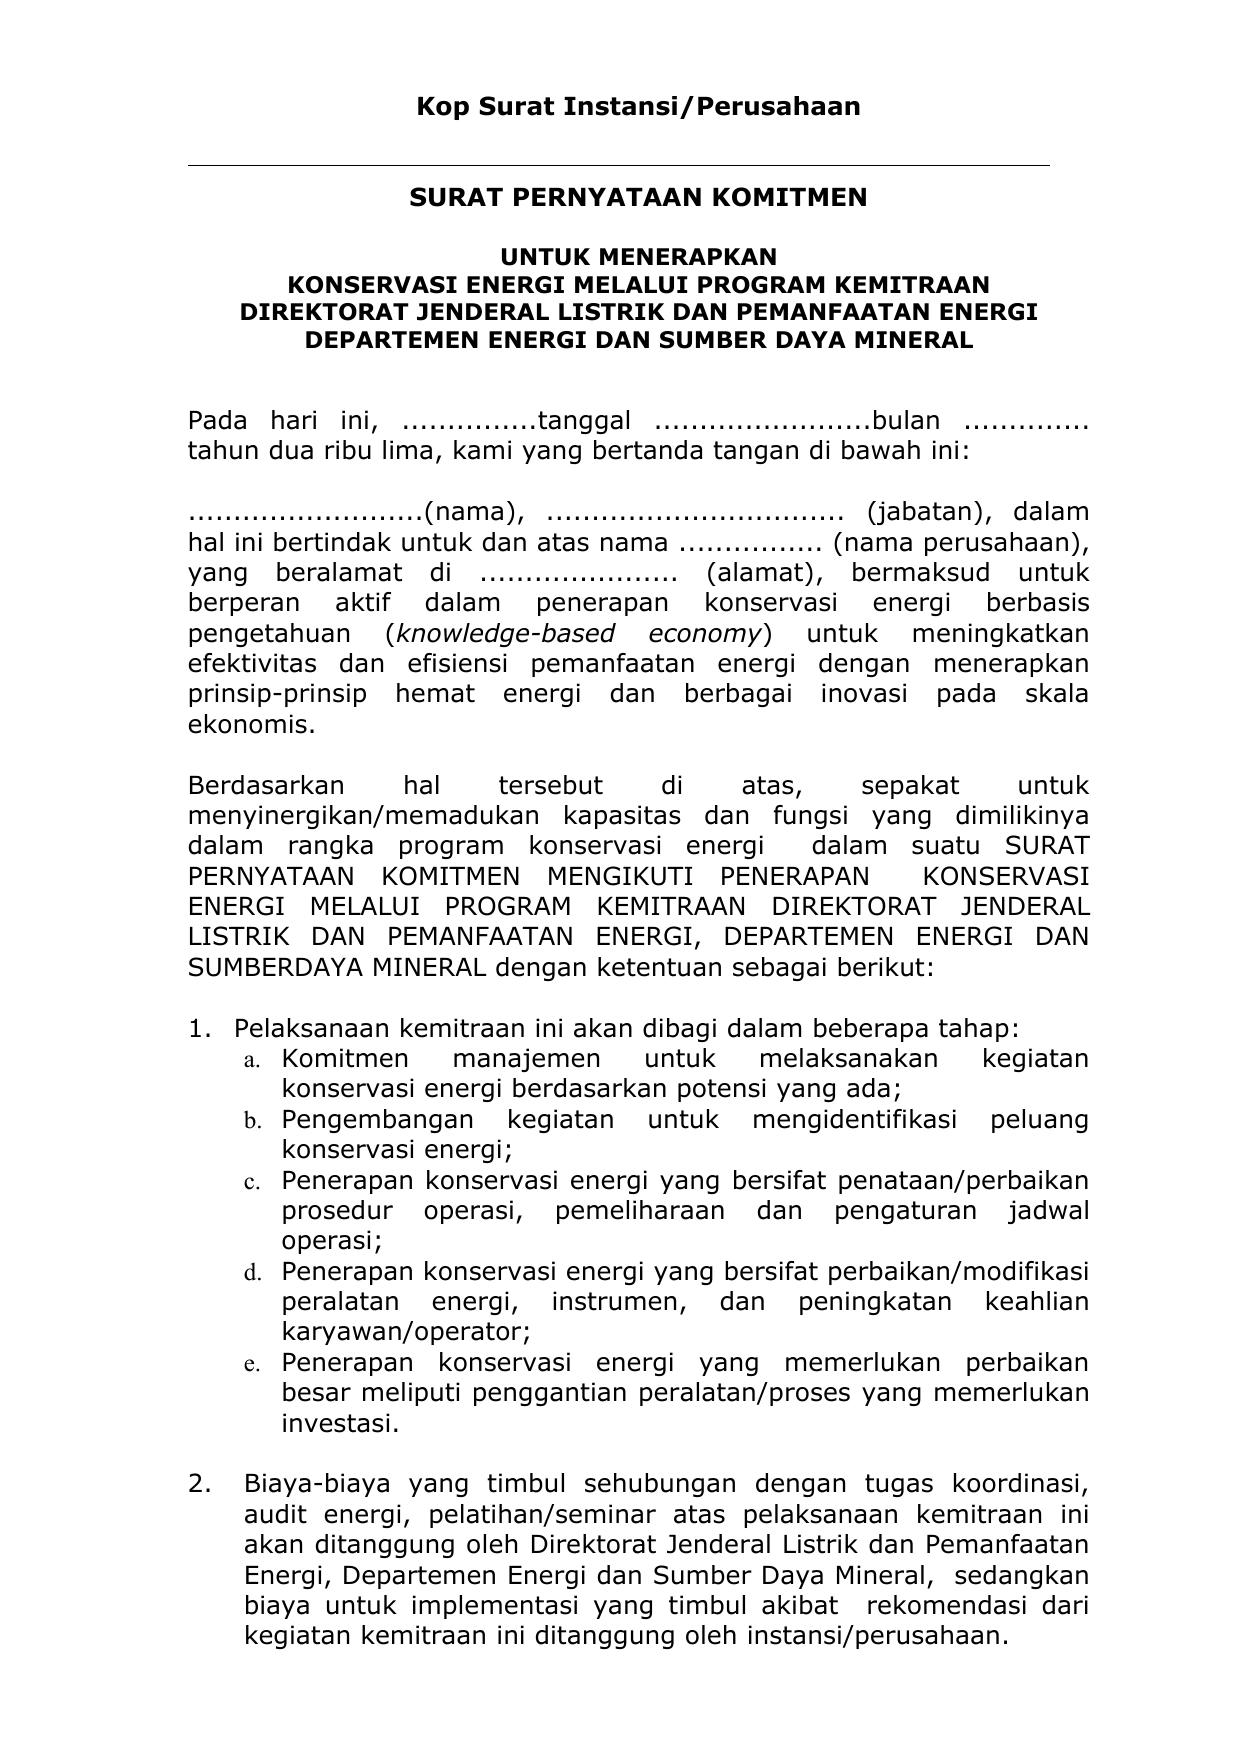 Memorandum Kesepakatan Bersama Direktorat Jenderal Listrik